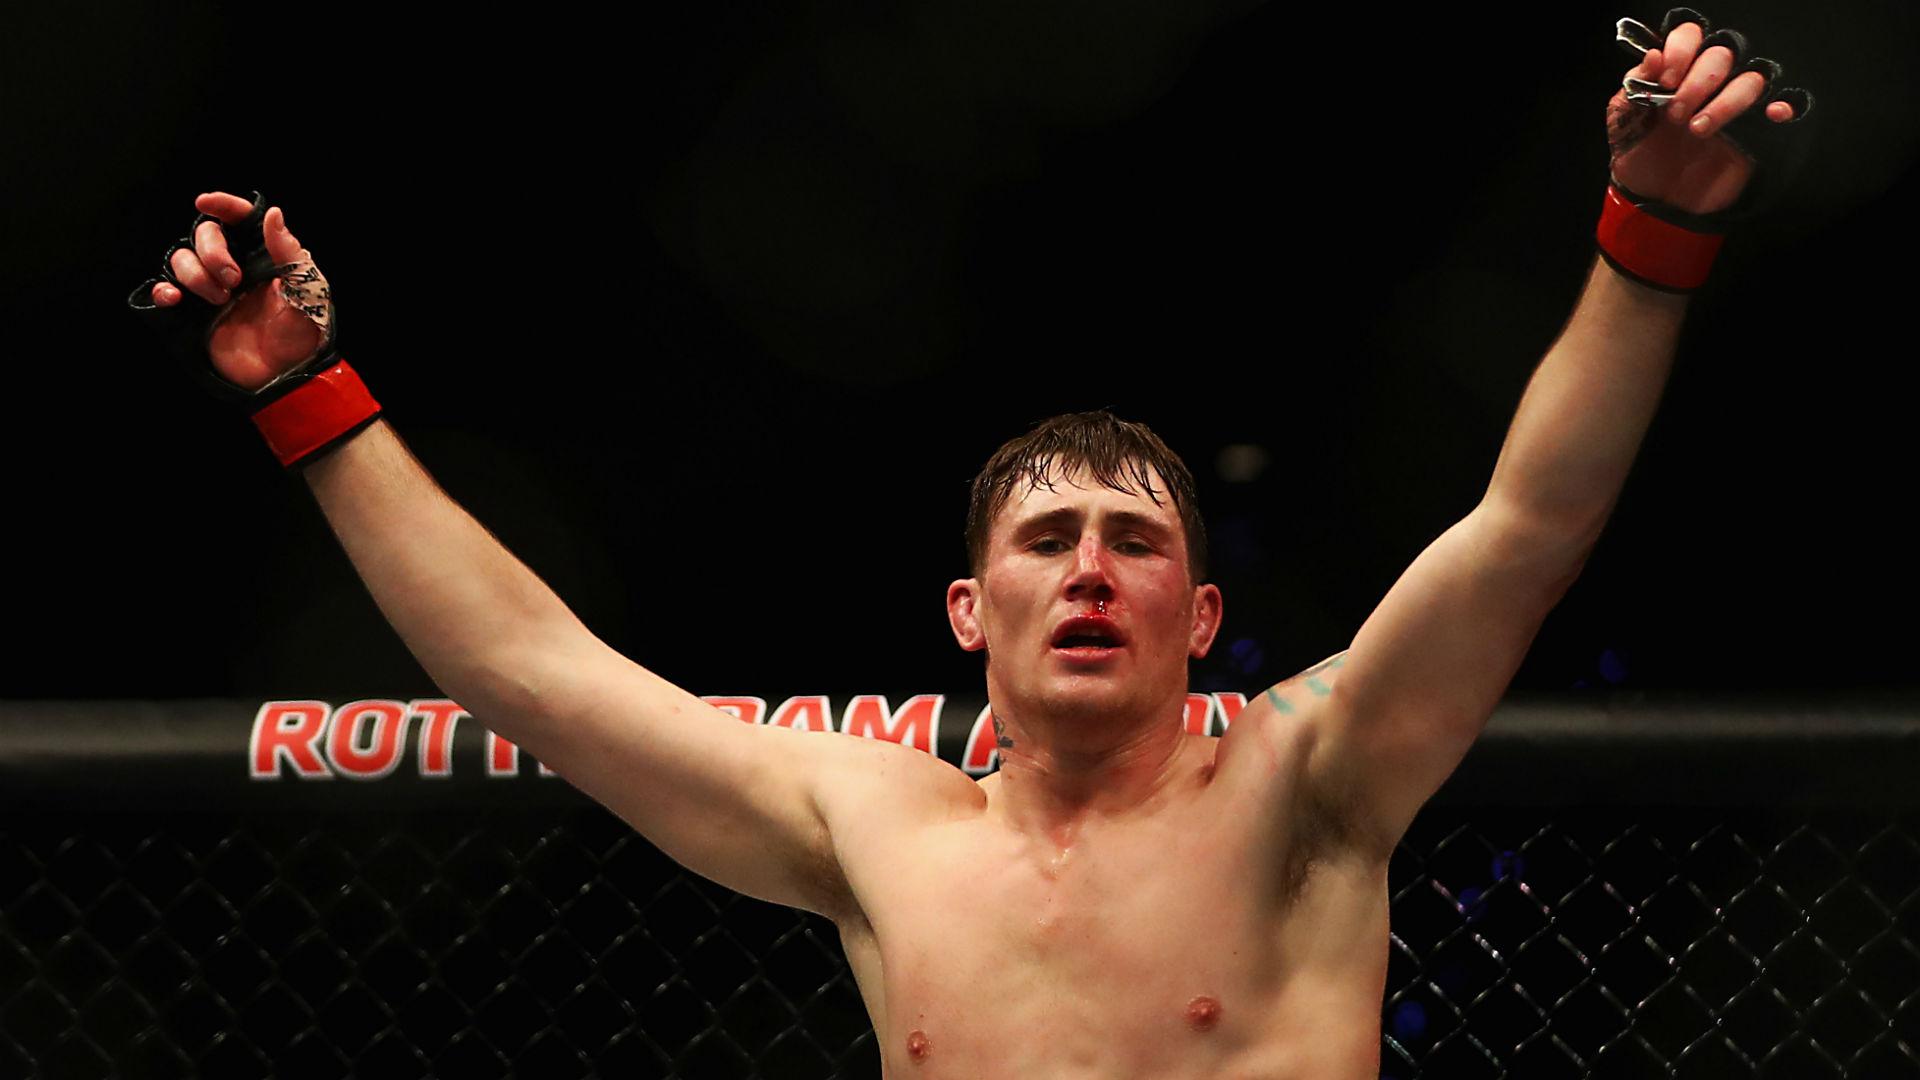 UFC Fight Night 118 results: Darren Till proves he's legit; all eyes on Aspen Ladd